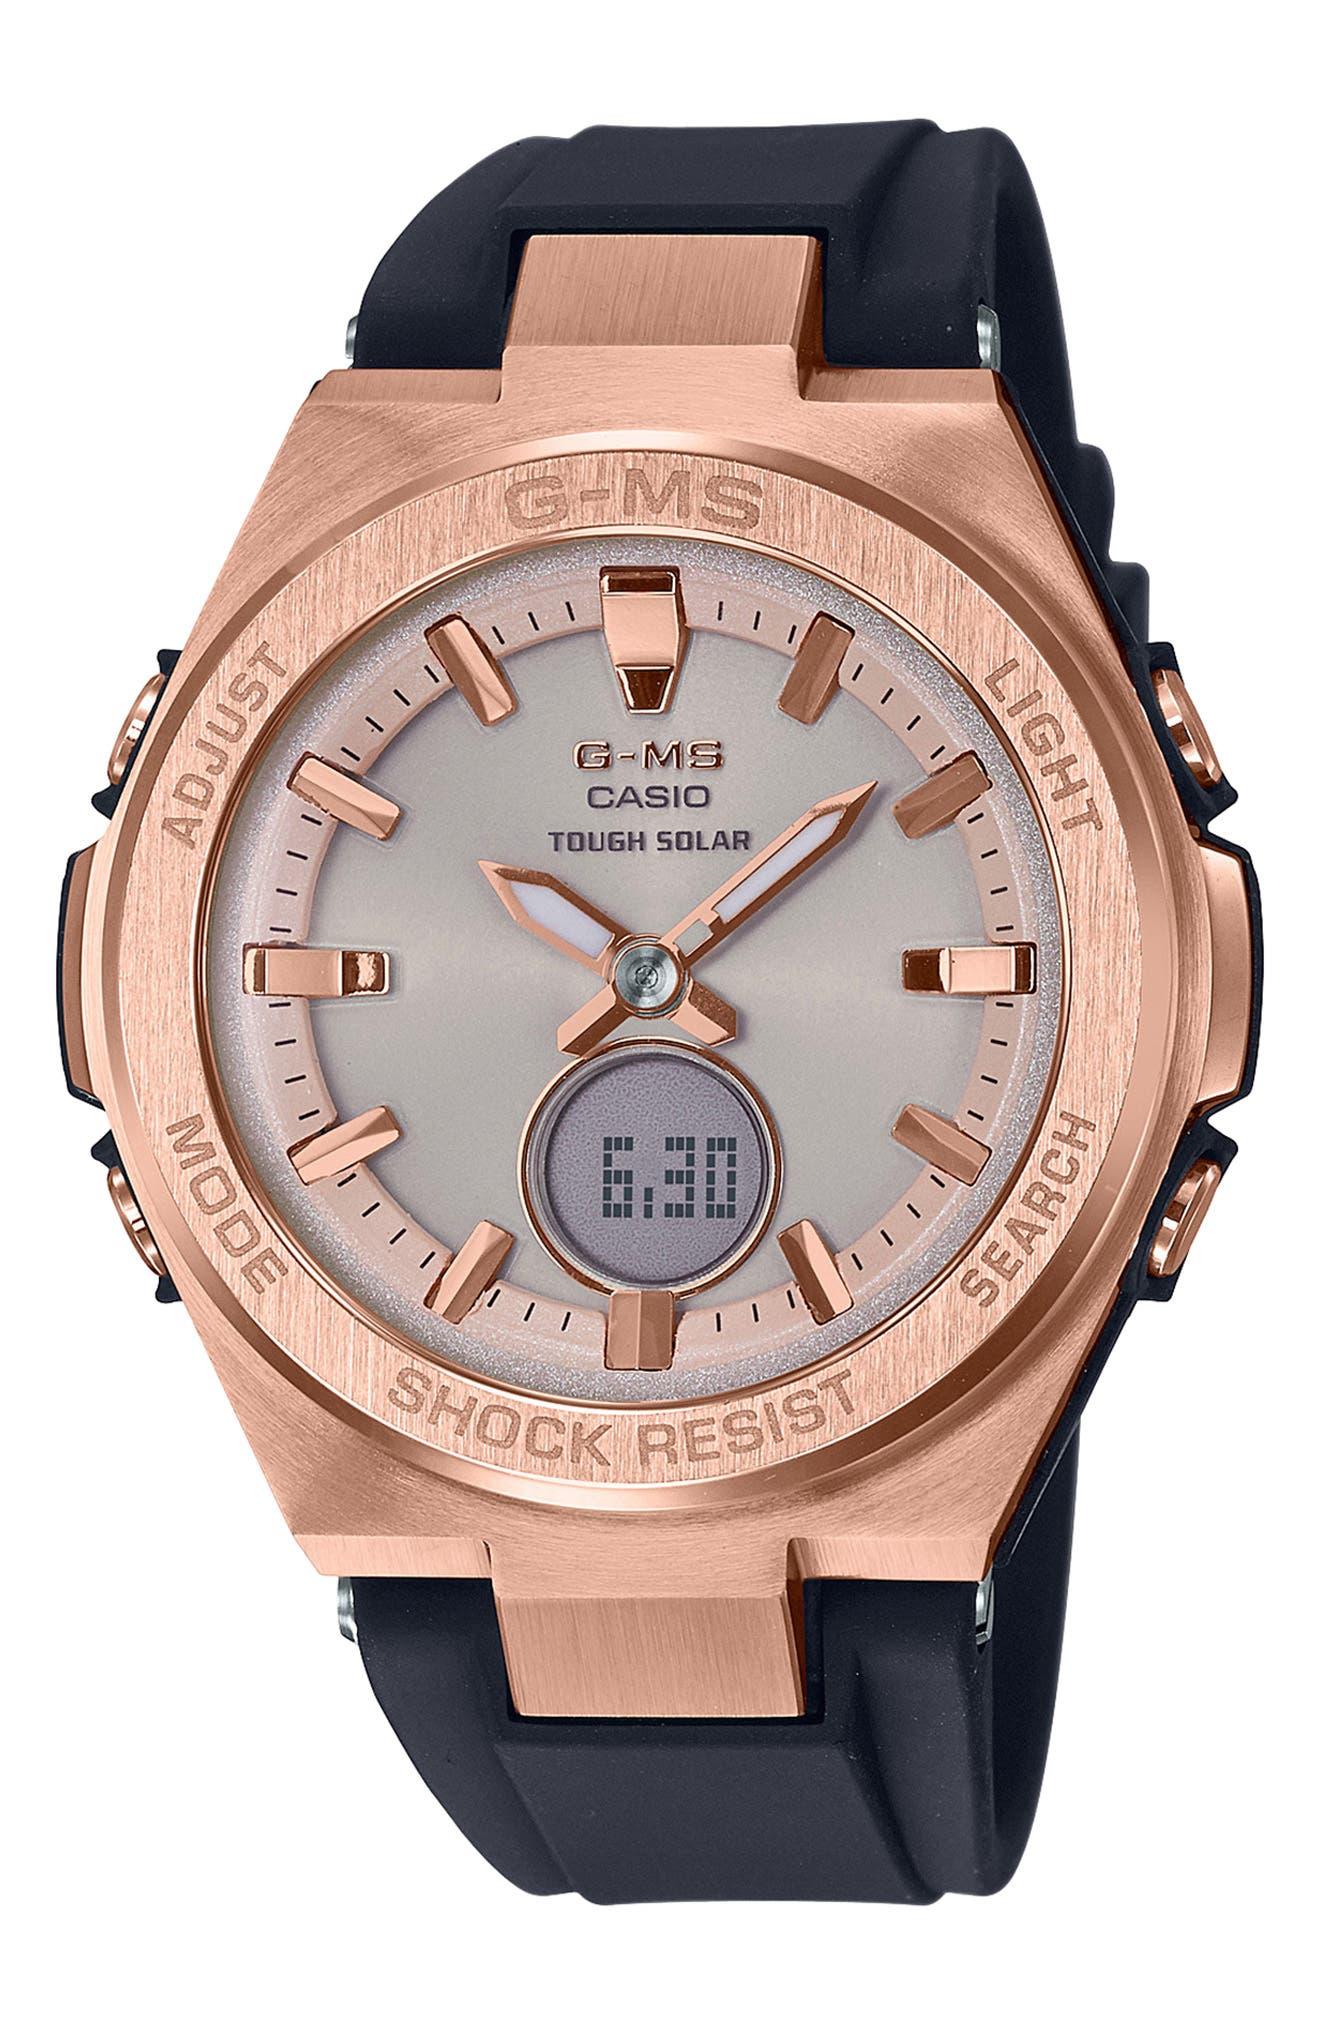 G-Shock G-MS Ana-Digi Resin Strap Watch, 38mm,                             Main thumbnail 1, color,                             001